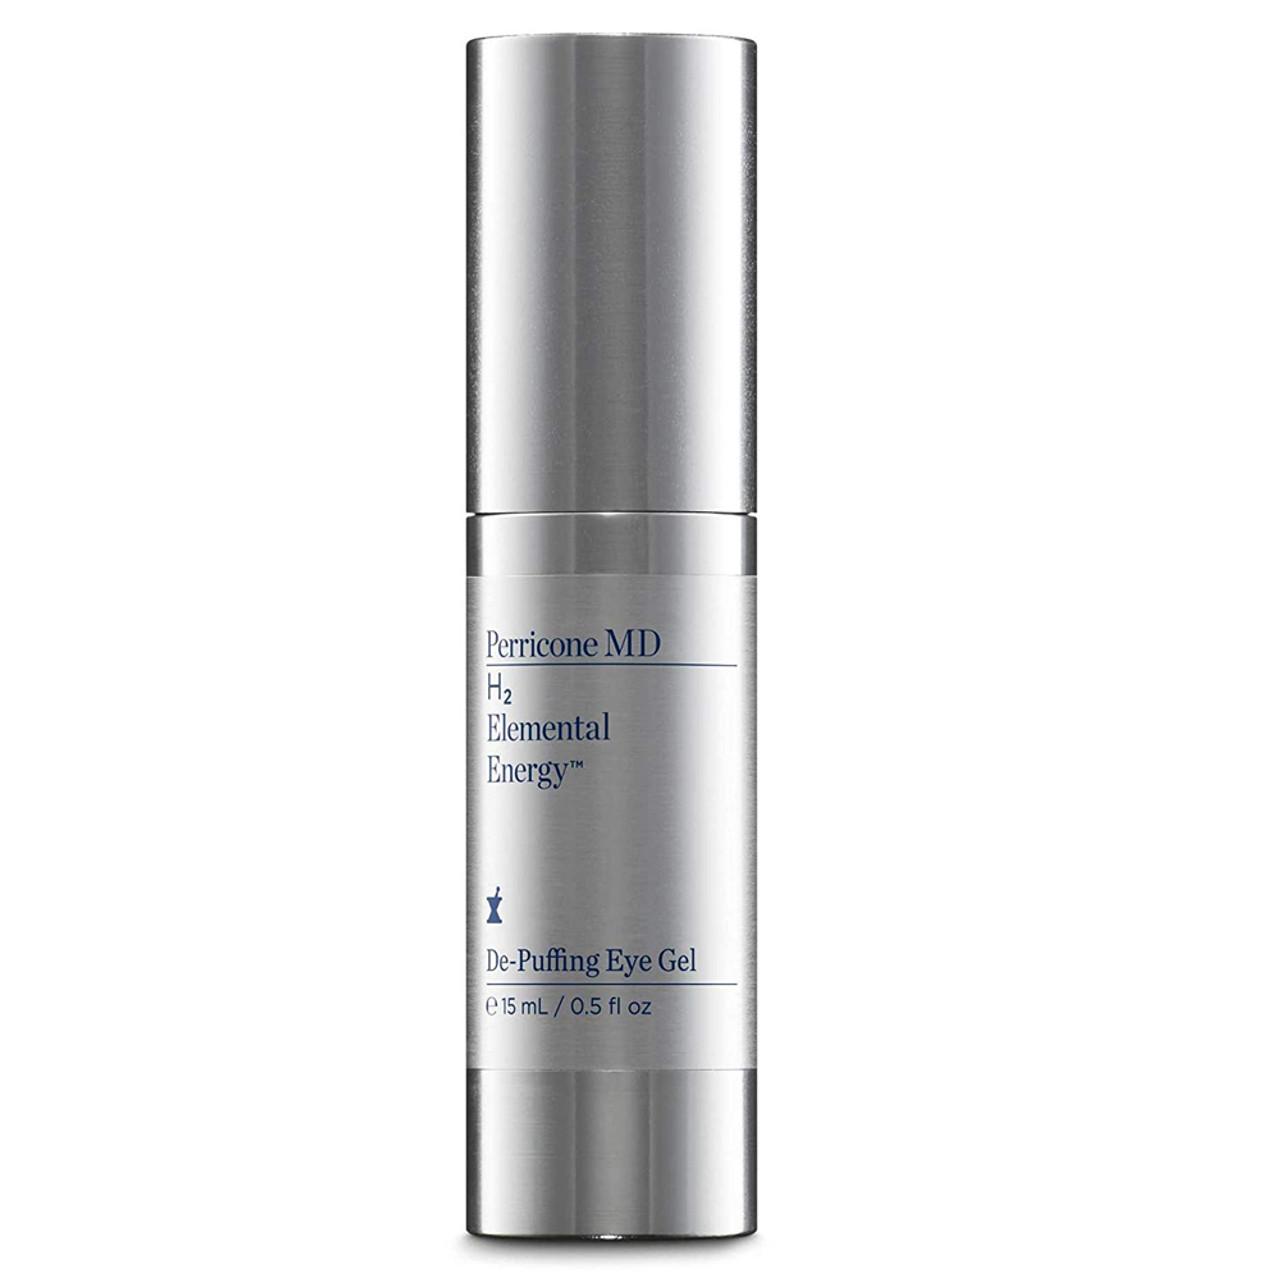 Perricone MD H2 Elemental Energy De-Puffing Eye Gel (discontinued) BeautifiedYou.com